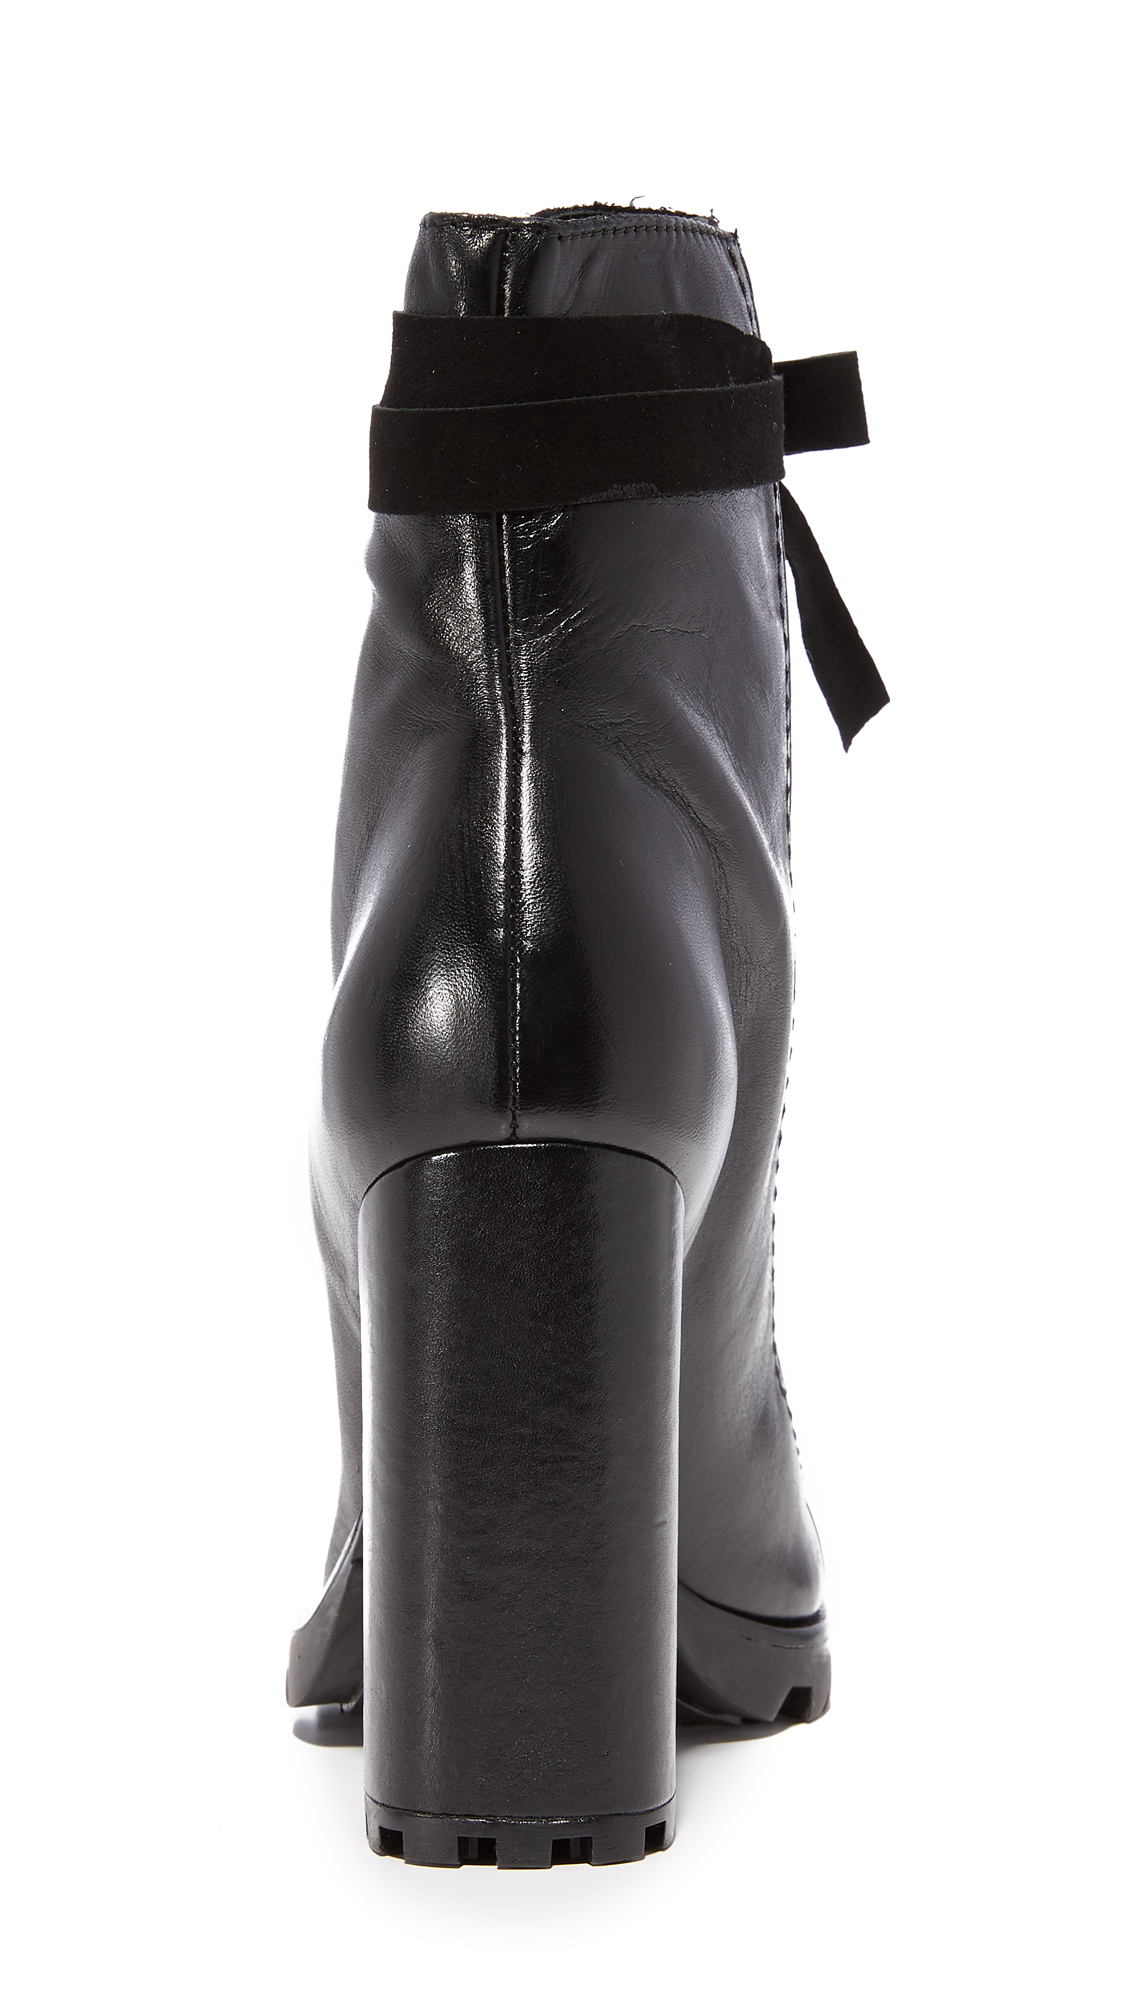 e9a1392866c7 Schutz Lisie Bow Platform Boots